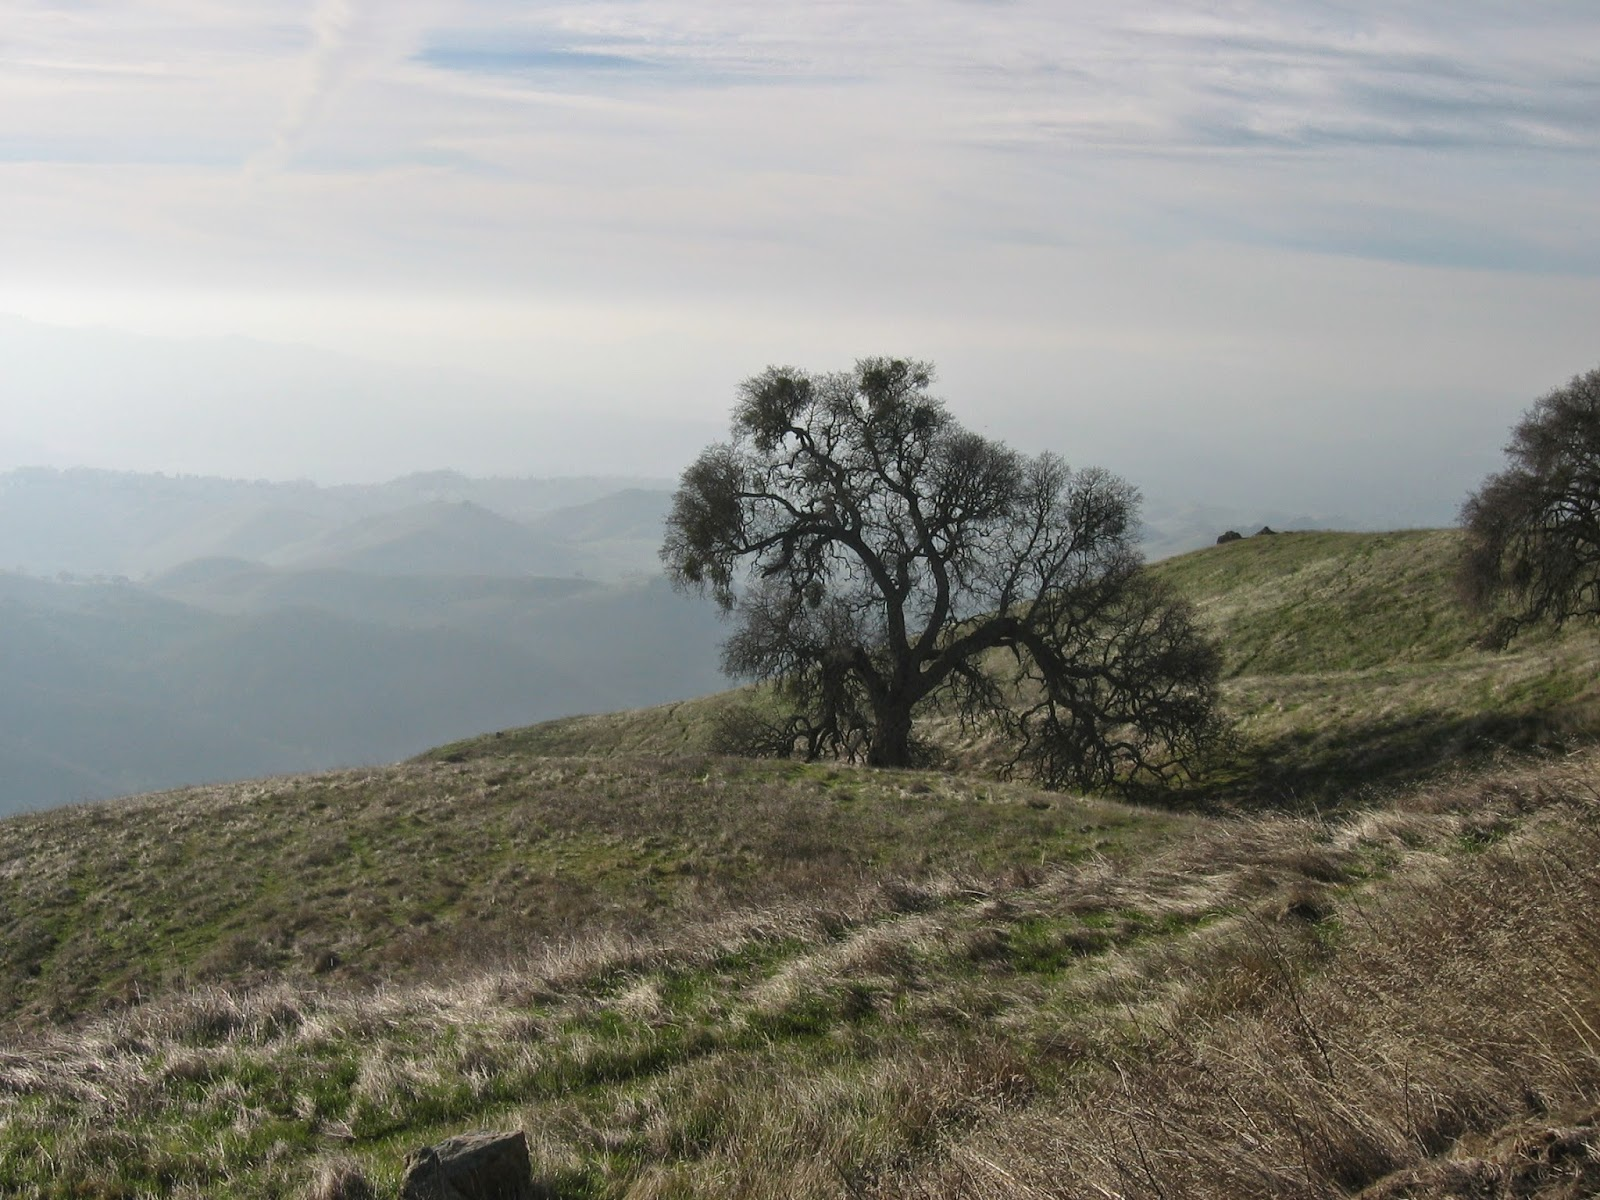 Mt. Diablo Regional Park, California by Rachel Medanic